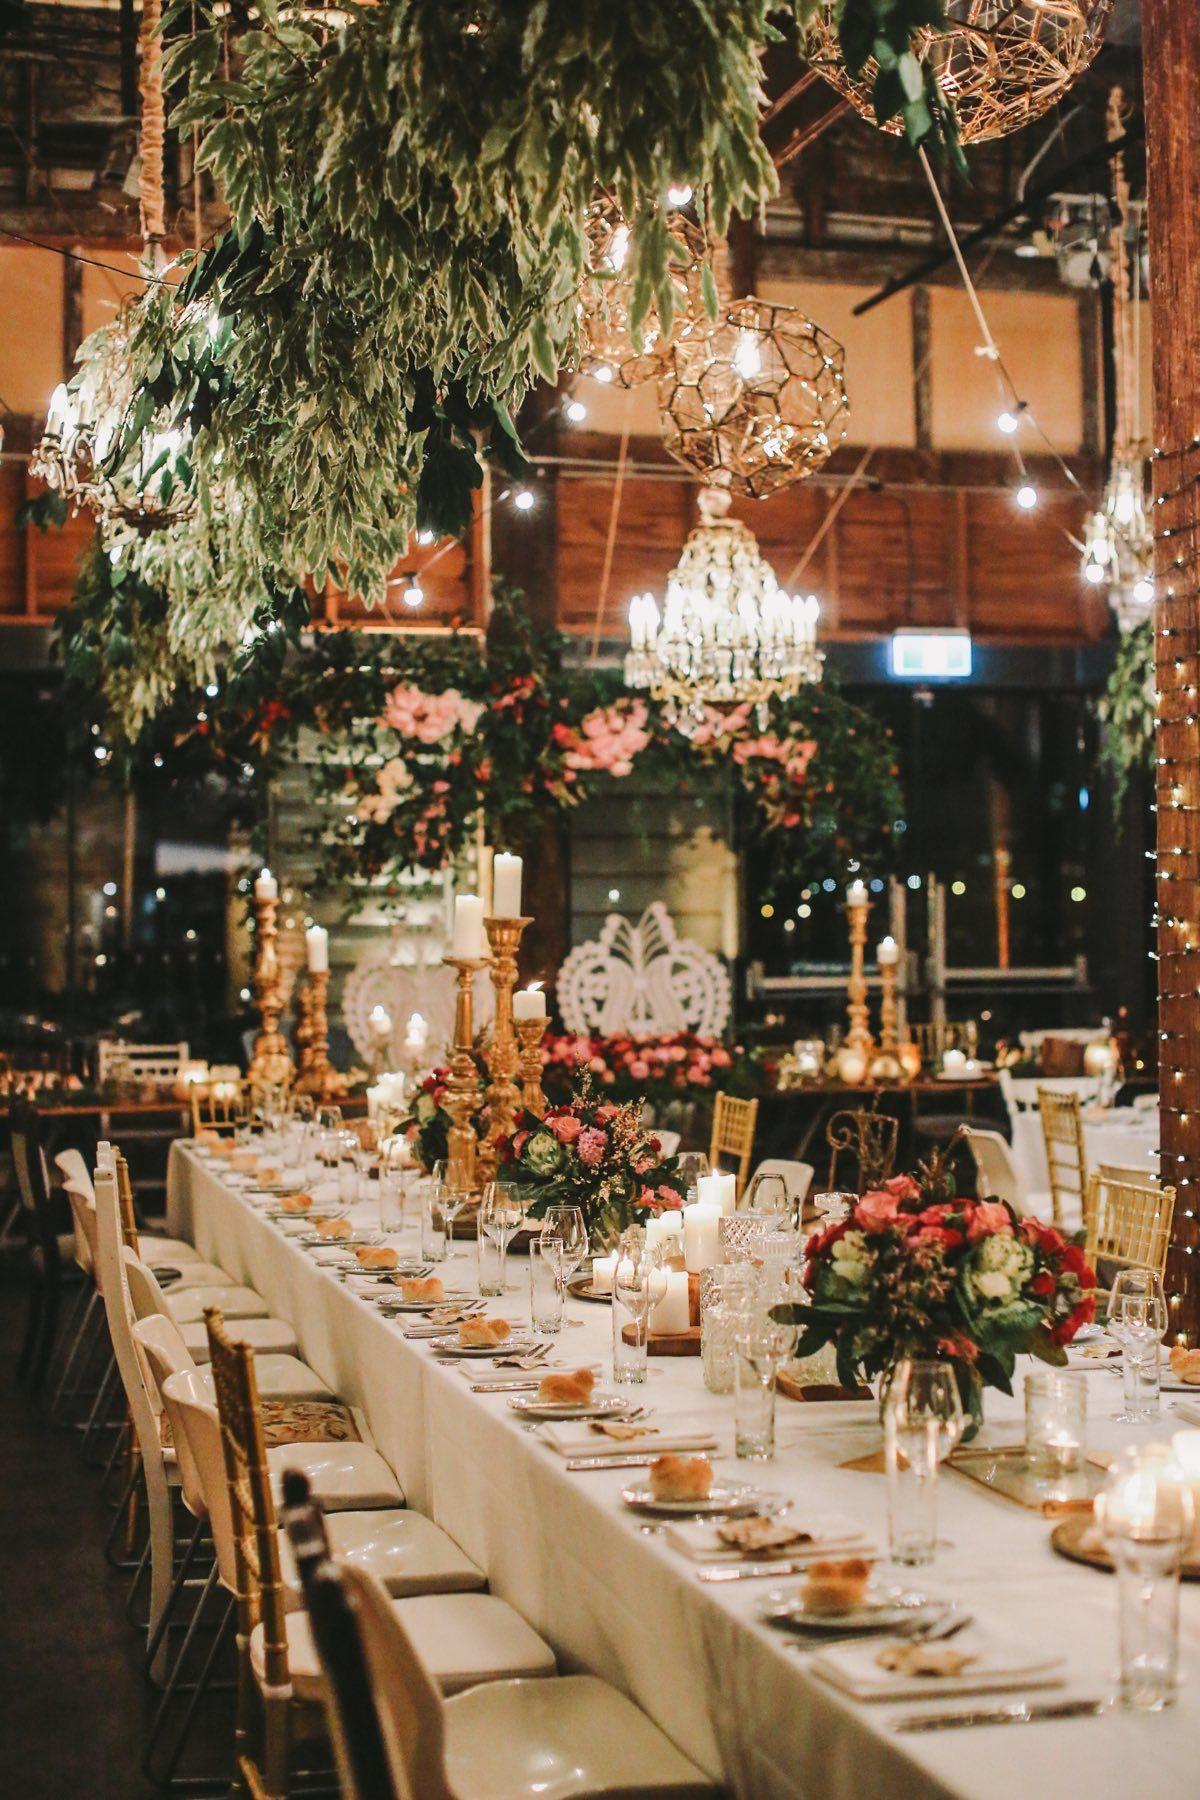 Sydney wedding romantic botanical garden theme wedding themes this sydney wedding twinkles with gorgeous details that create a chic and romantic botanical garden themed wedding photos by lara hotz photography junglespirit Gallery